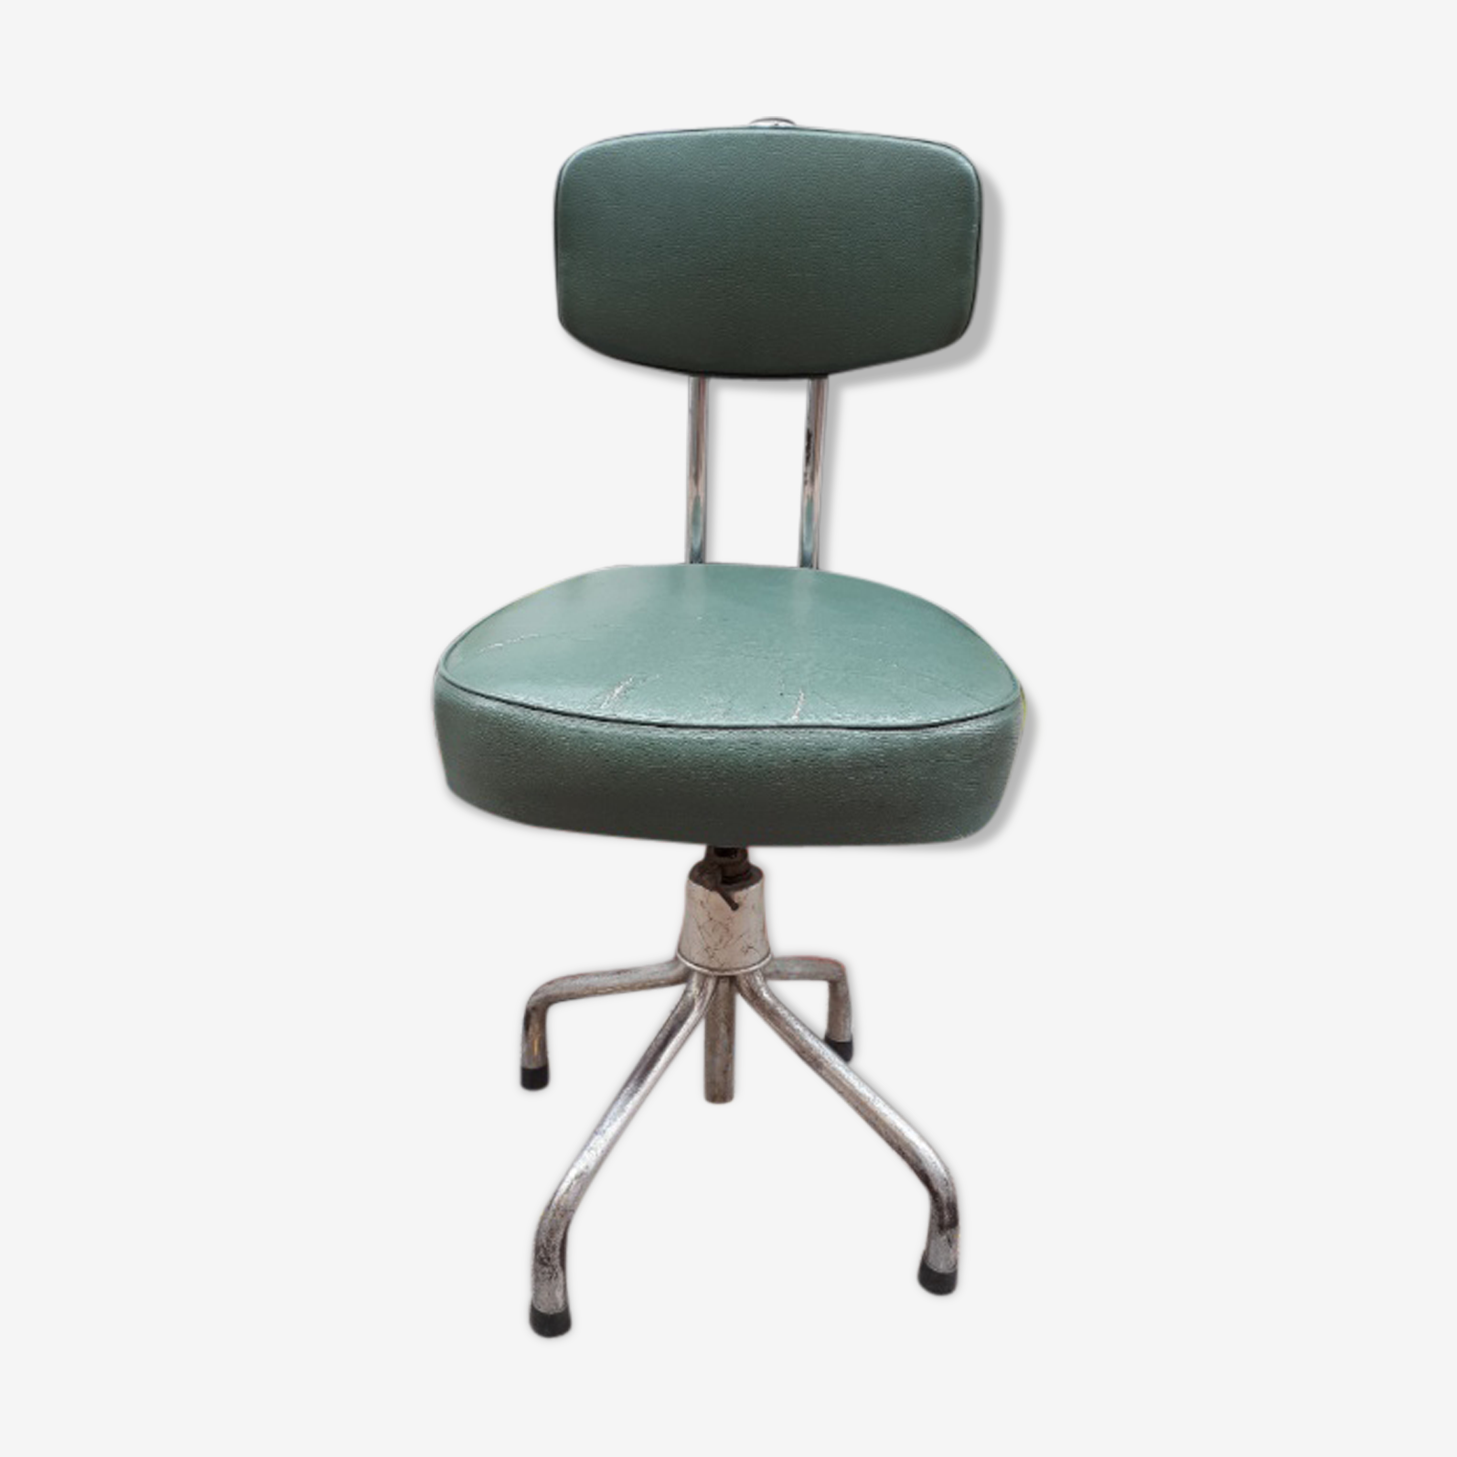 Chair desk vintage Roneo 1950-1960